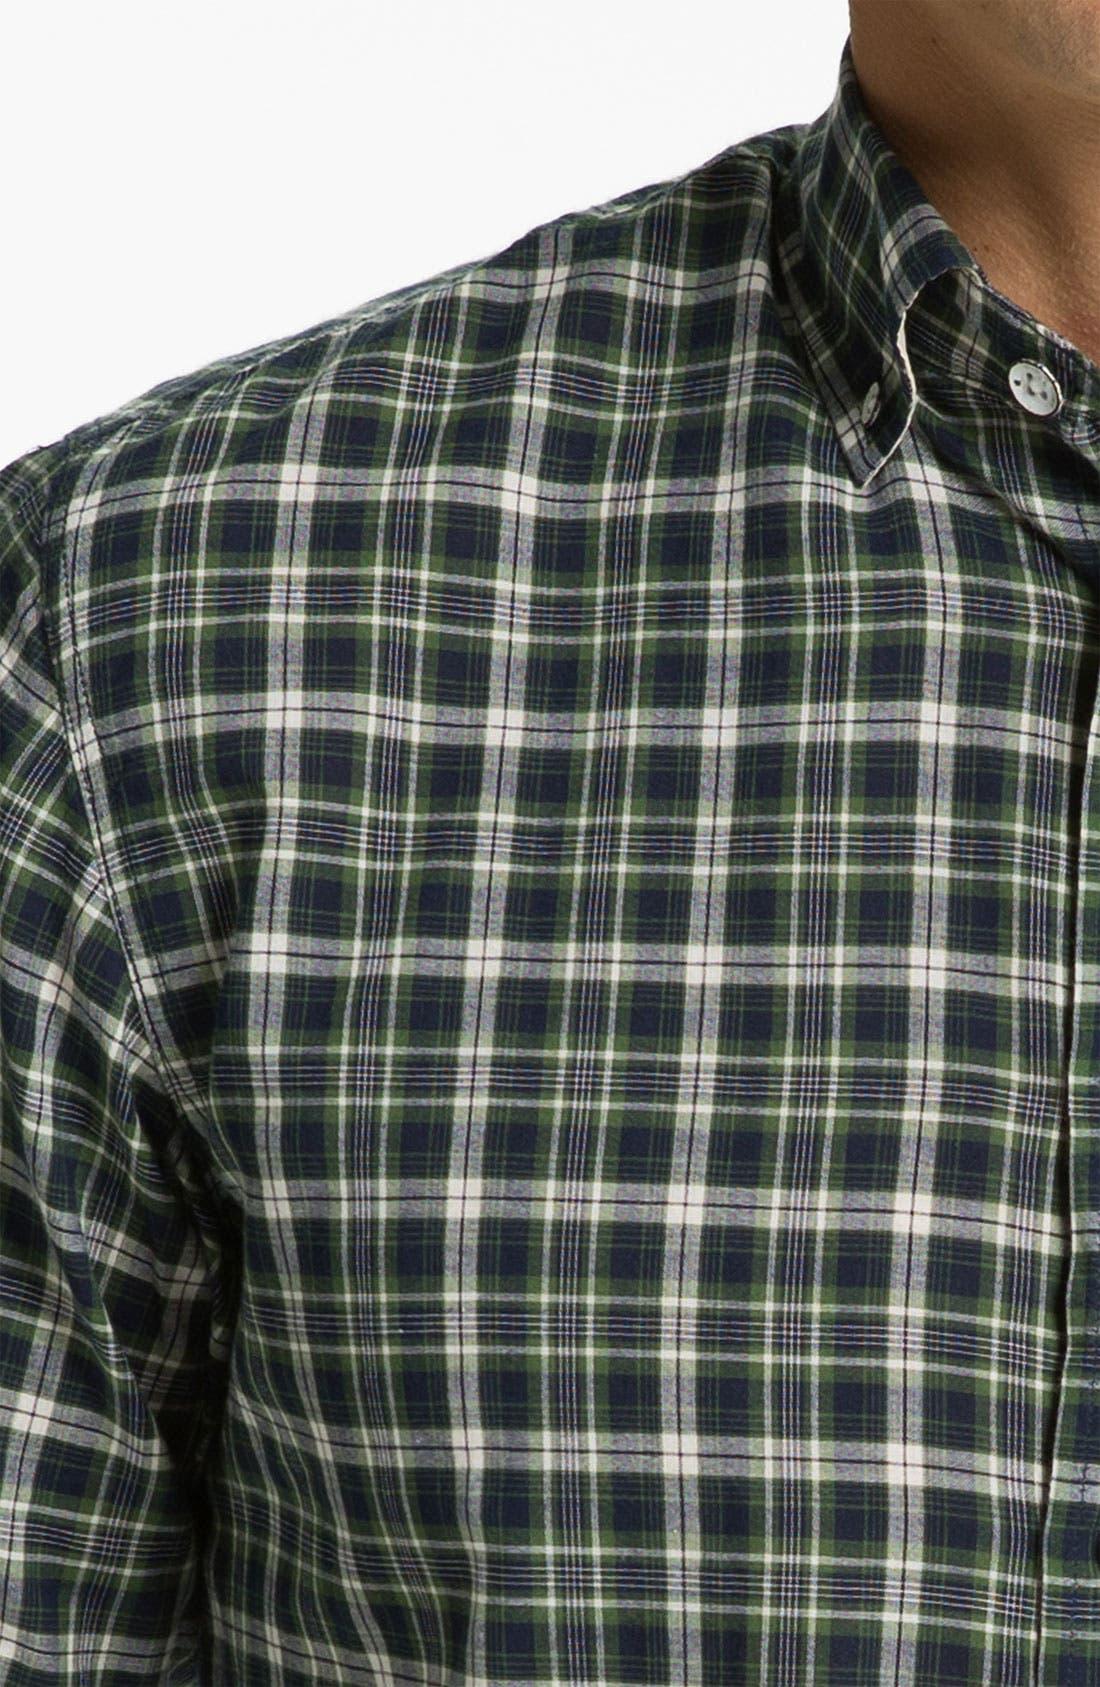 Alternate Image 3  - rag & bone Plaid Oxford Shirt